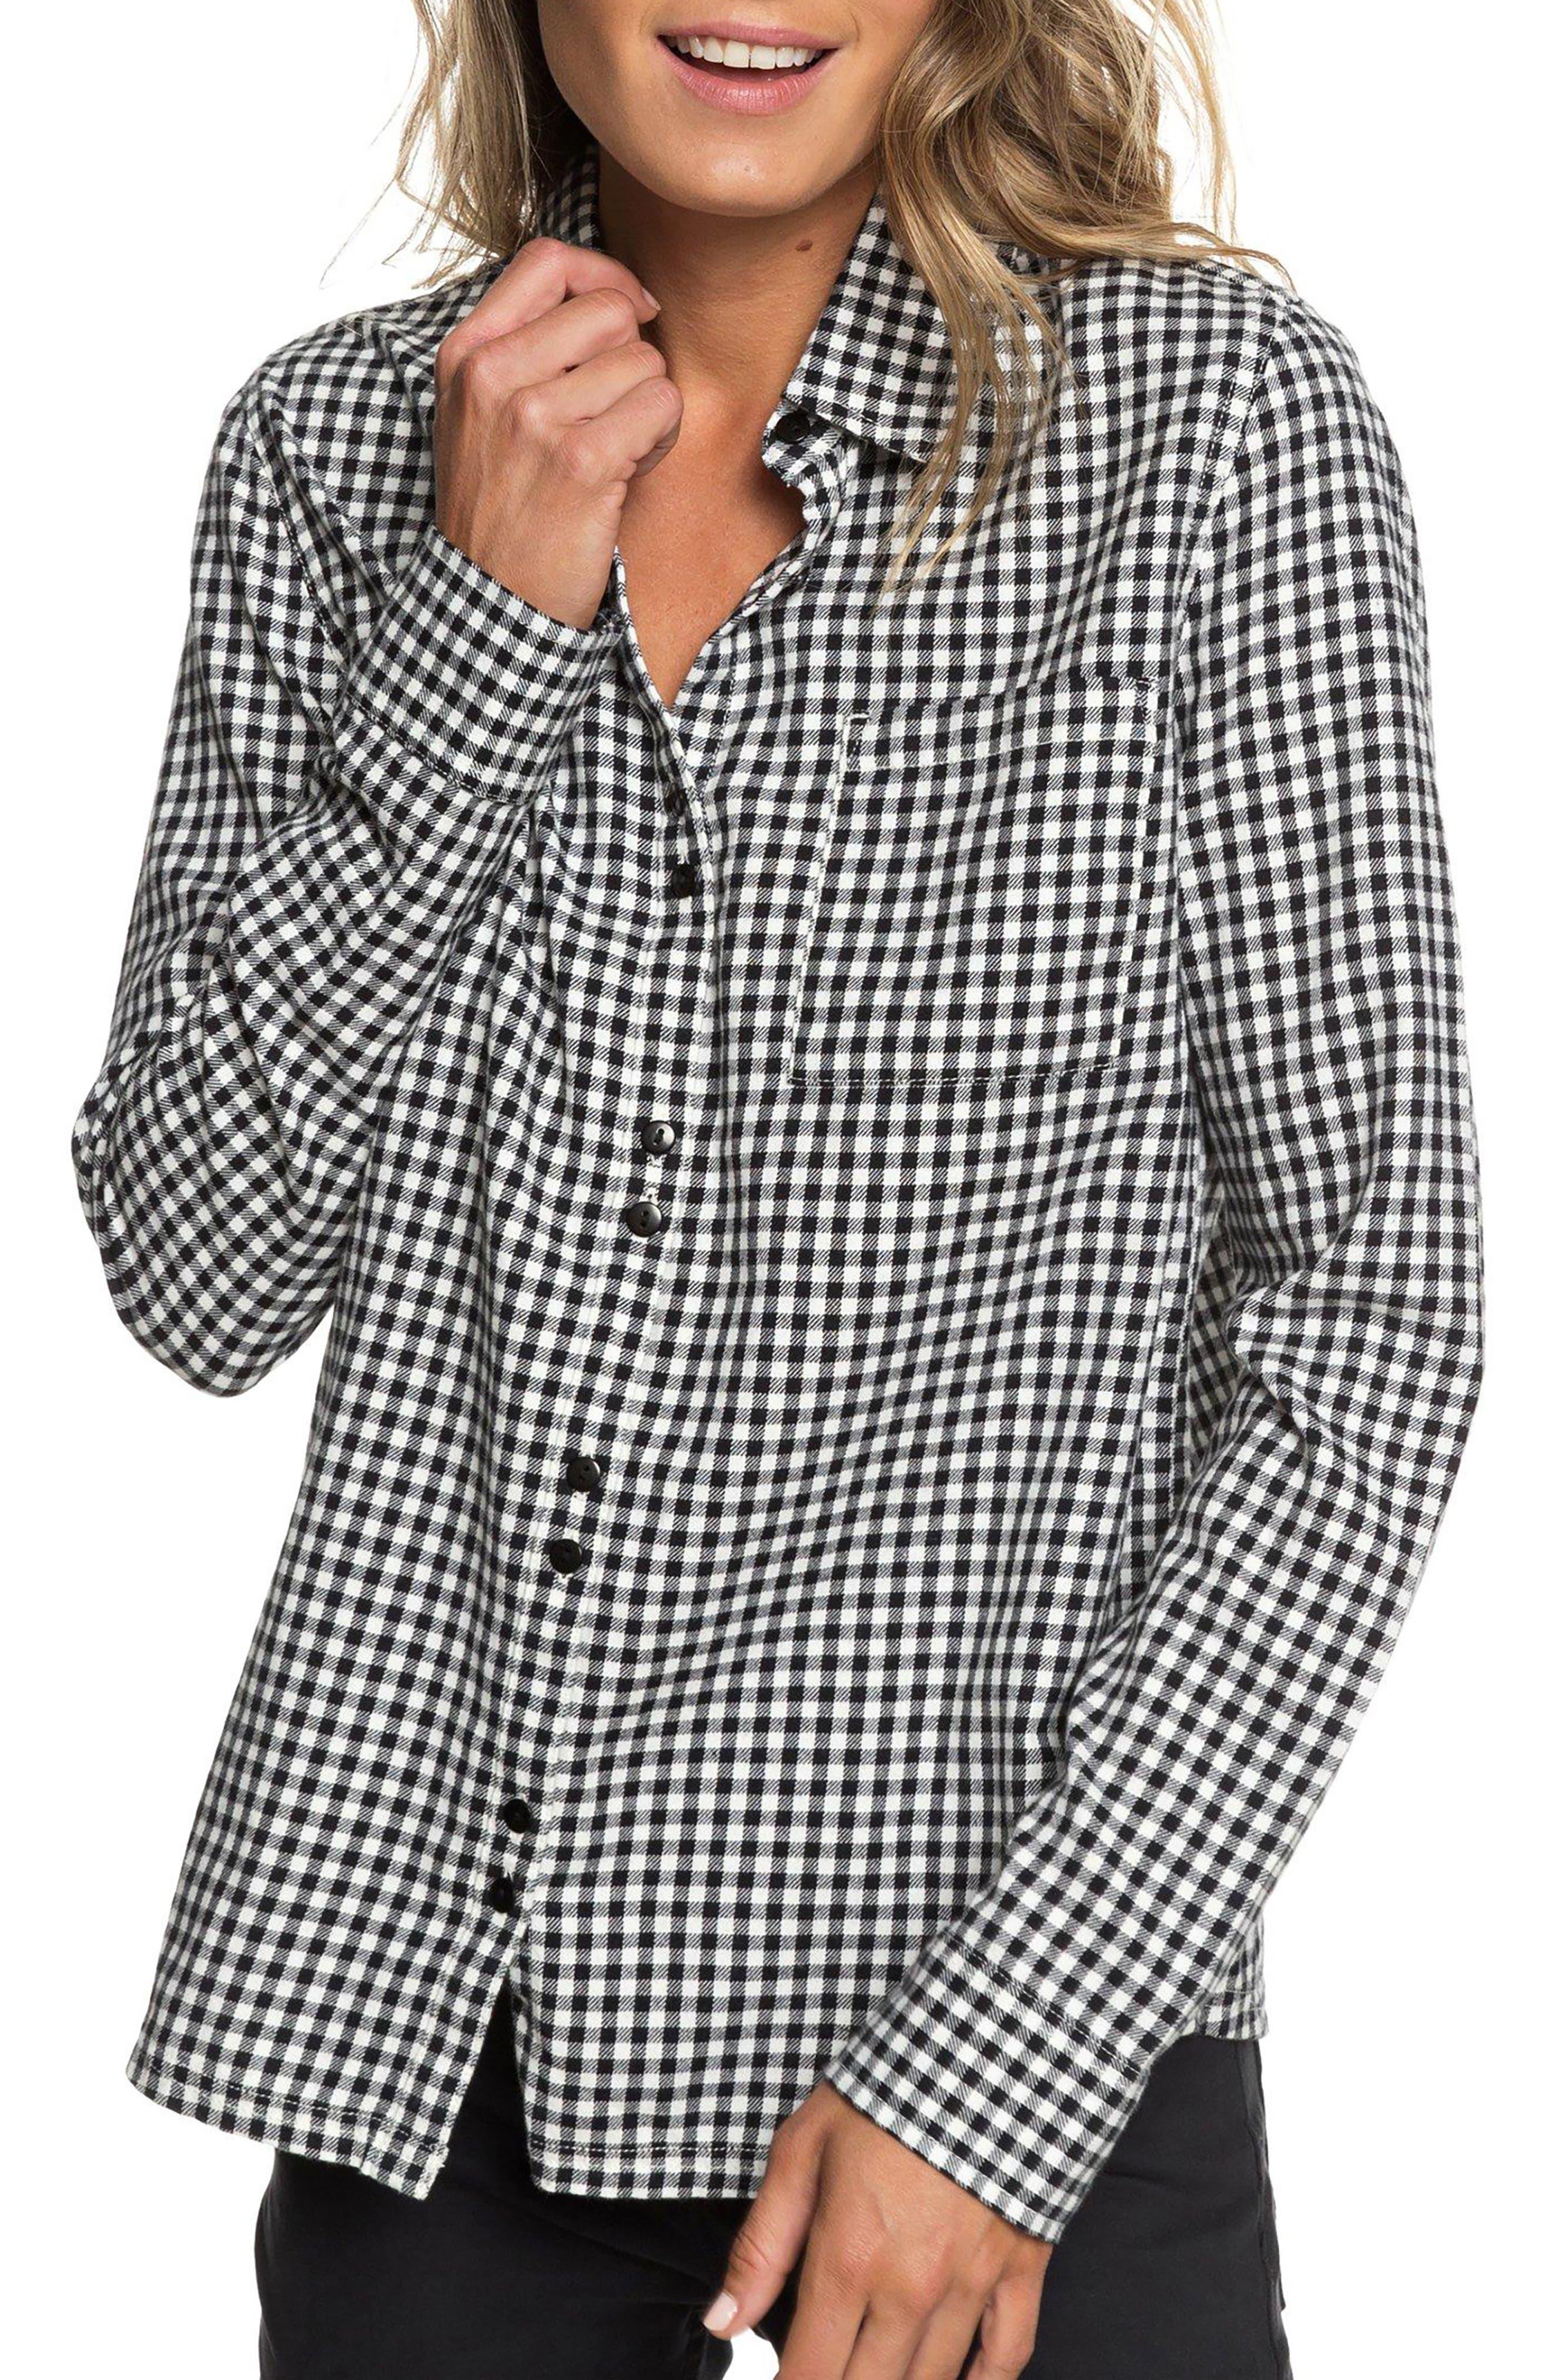 Concrete Streets Gingham Flannel Shirt,                         Main,                         color, 001